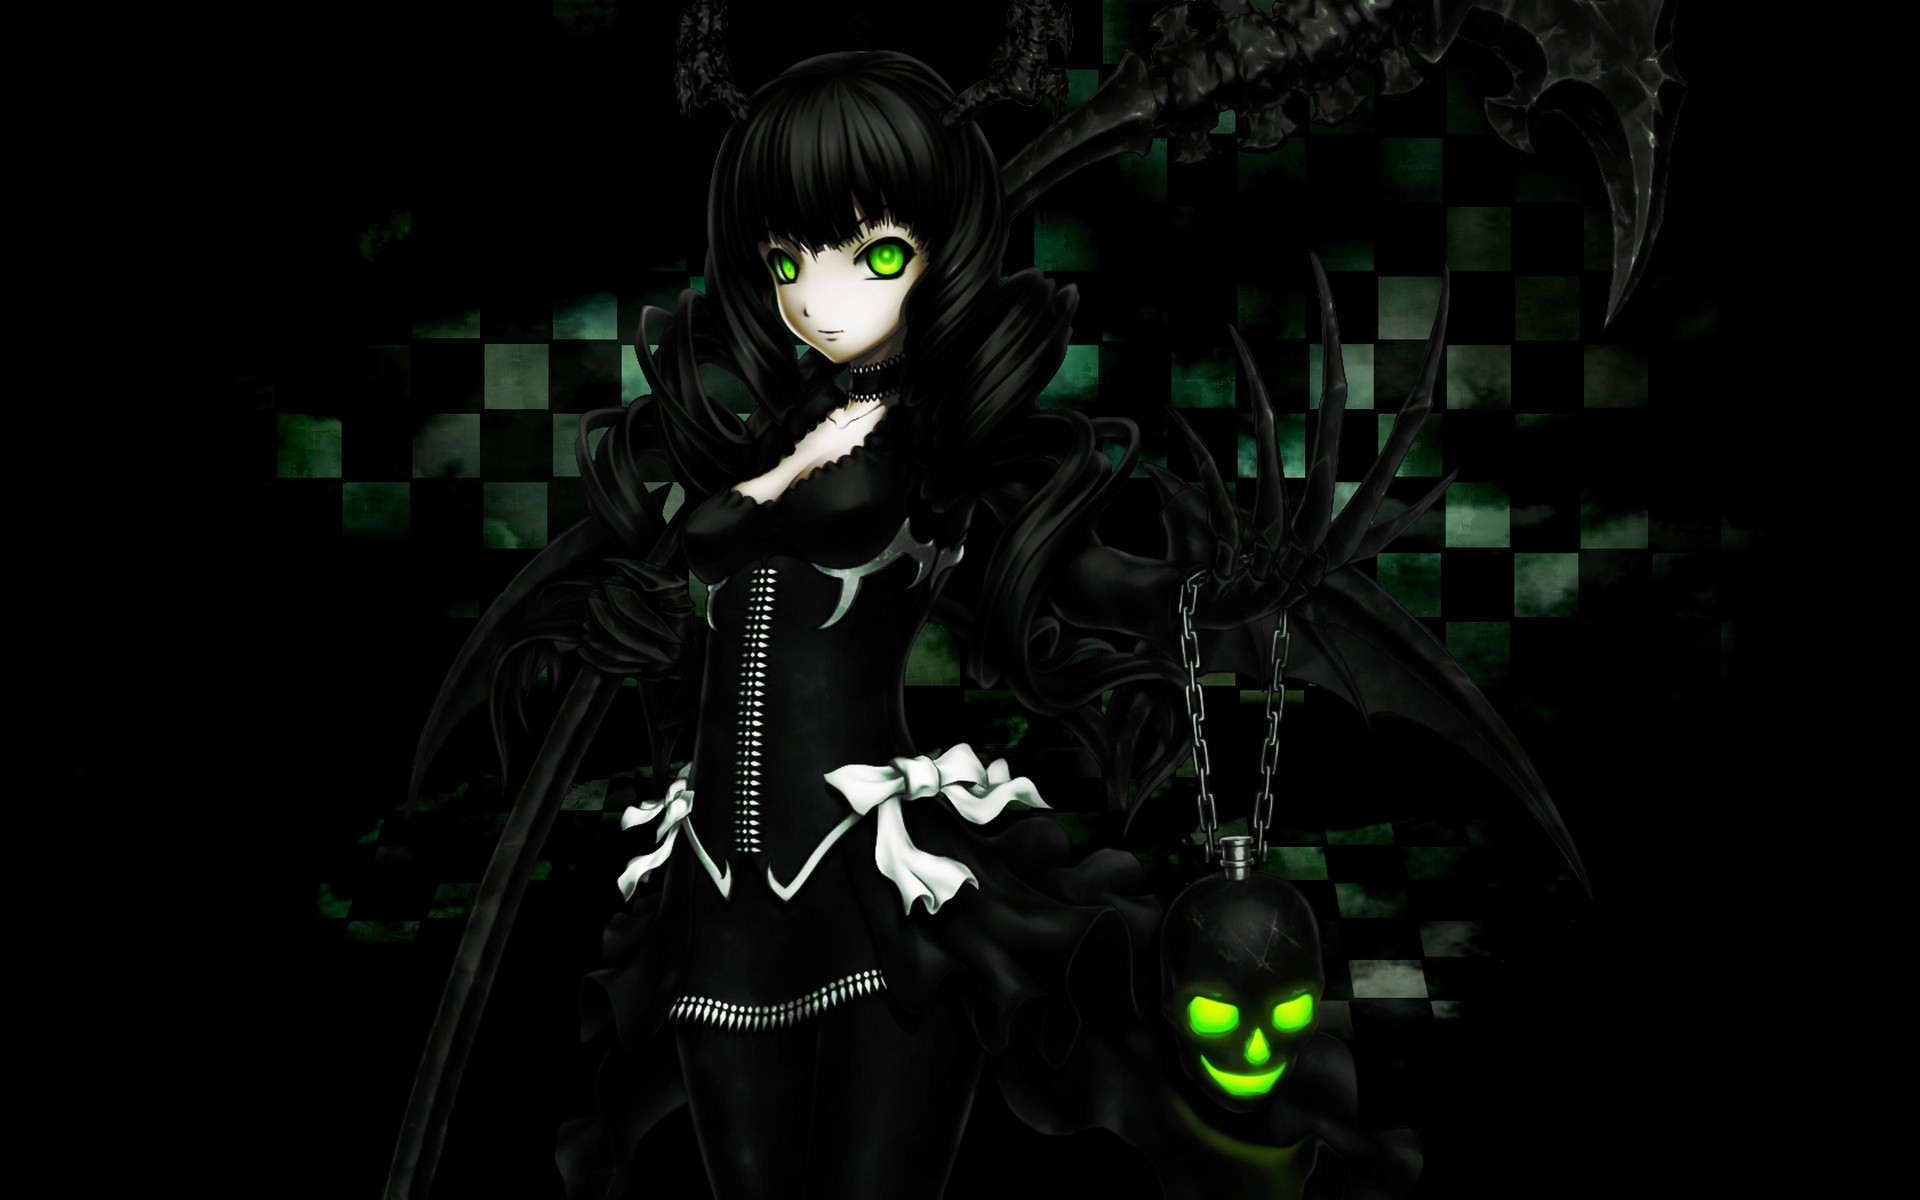 imagesci.com/dark-anime-girl-wallpaper-7871-hd-wallpapers.html